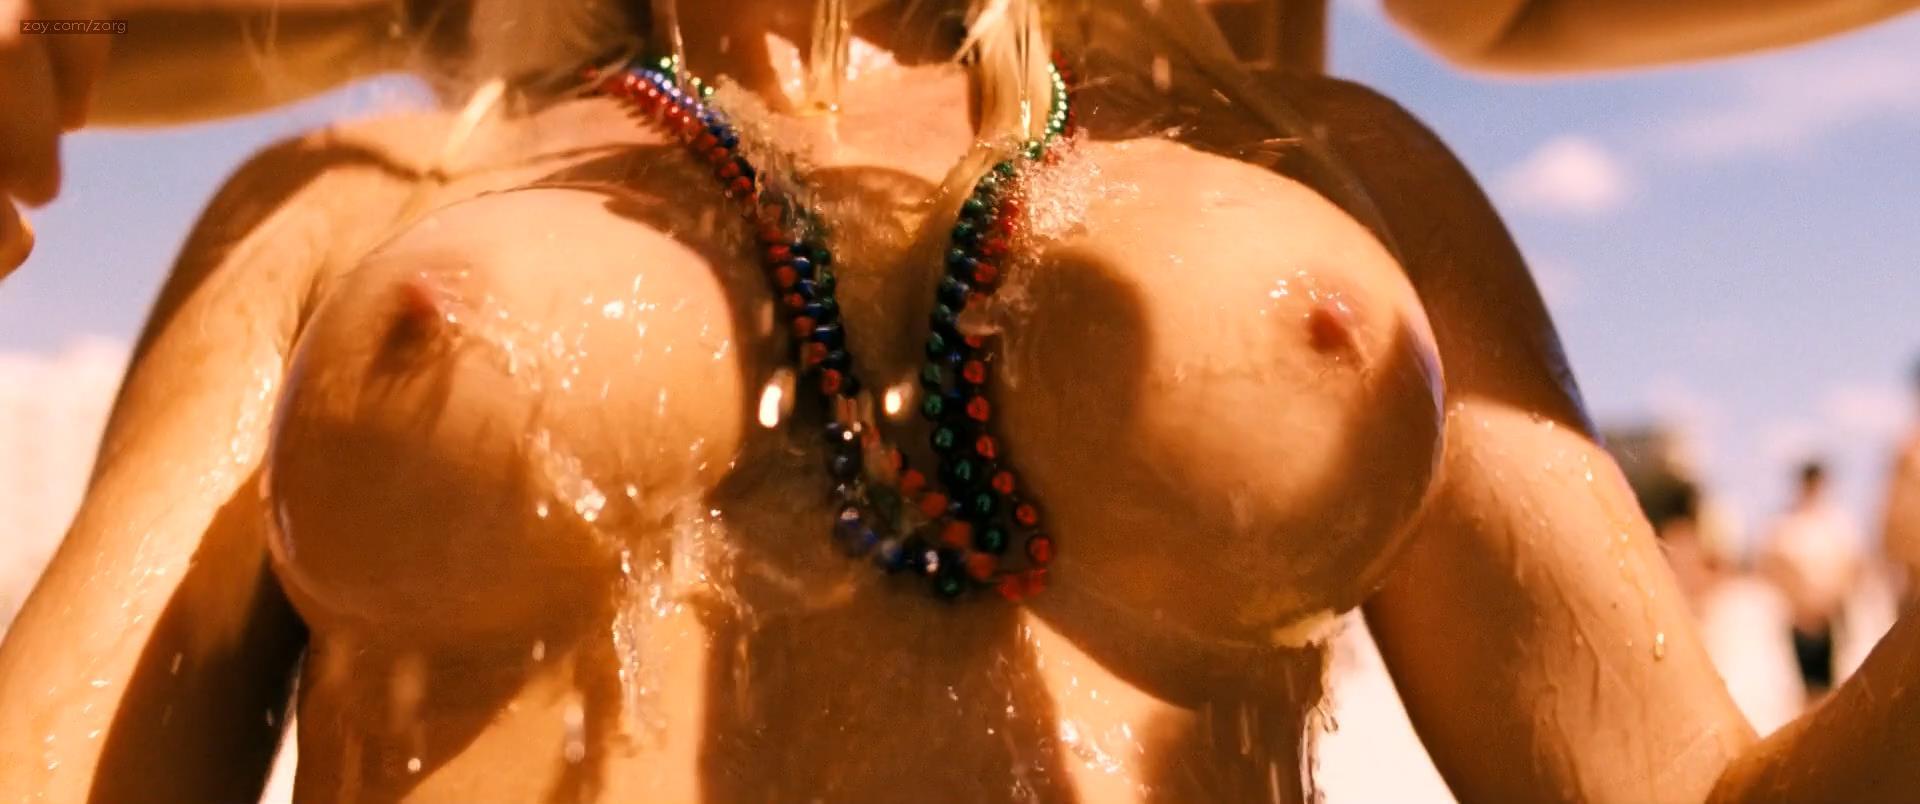 horny spring breakers naked